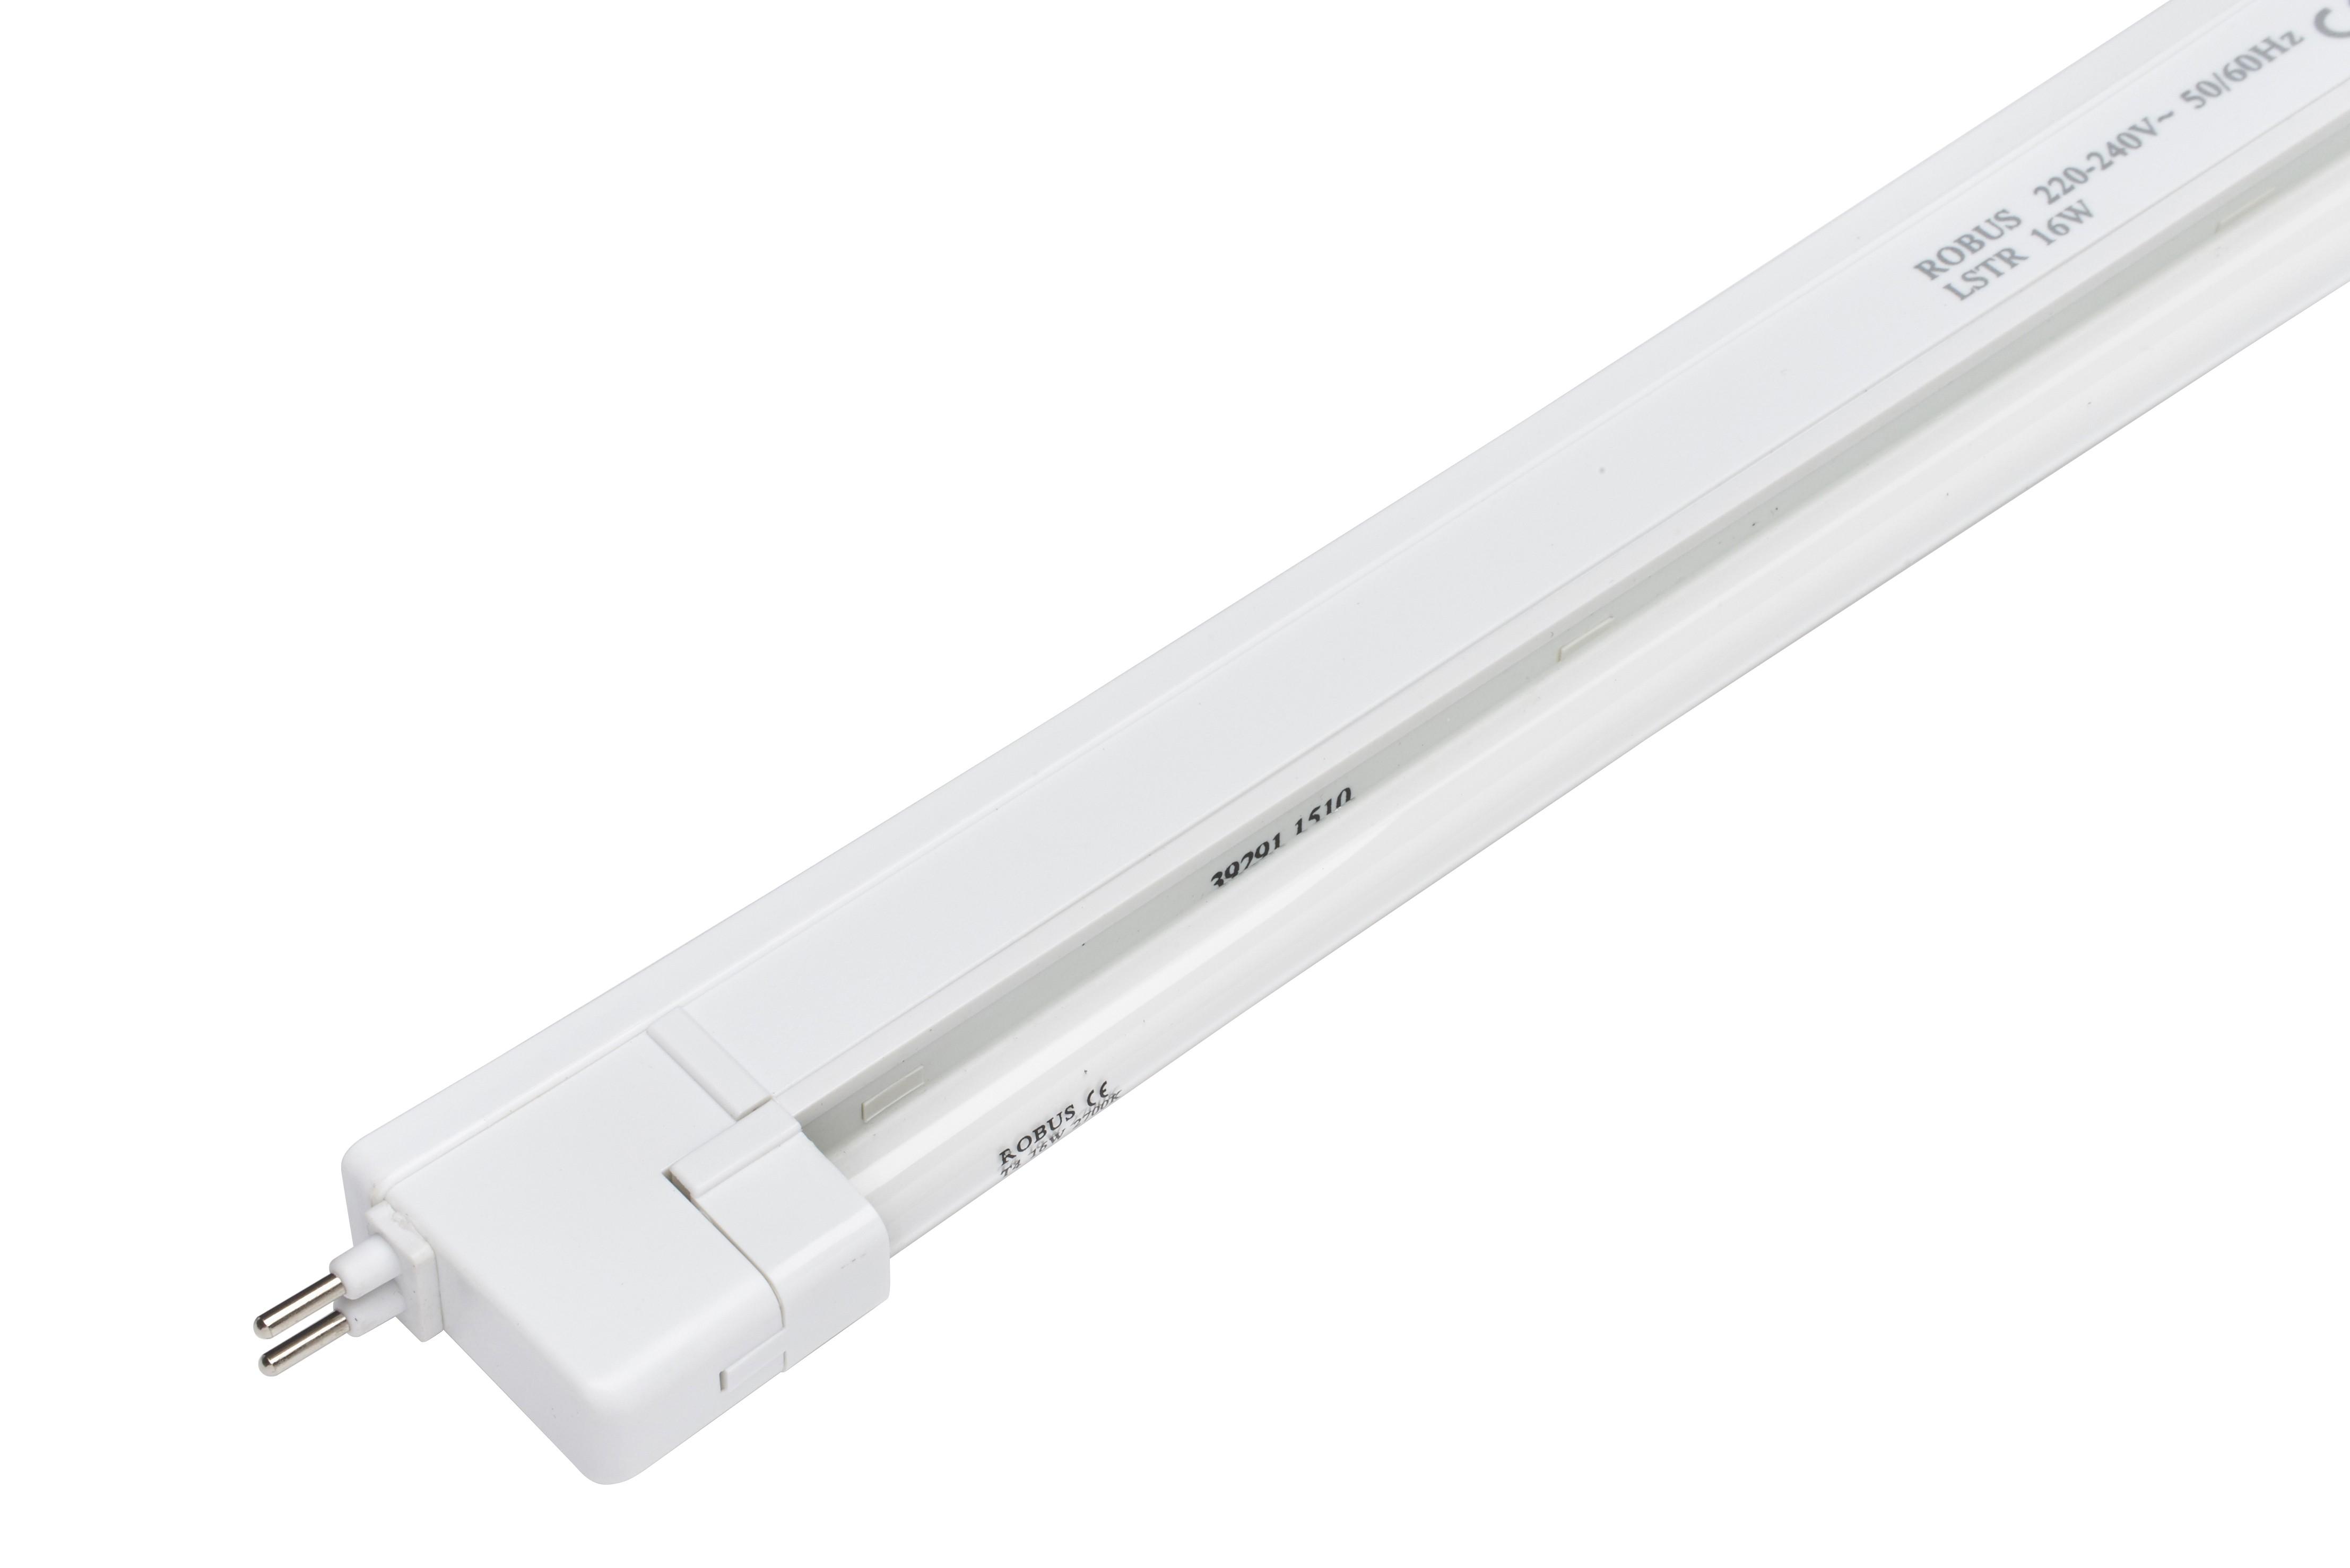 Marquee Light Fitting - Fluorescent Slim Style 400mm 16watt White - 240v only